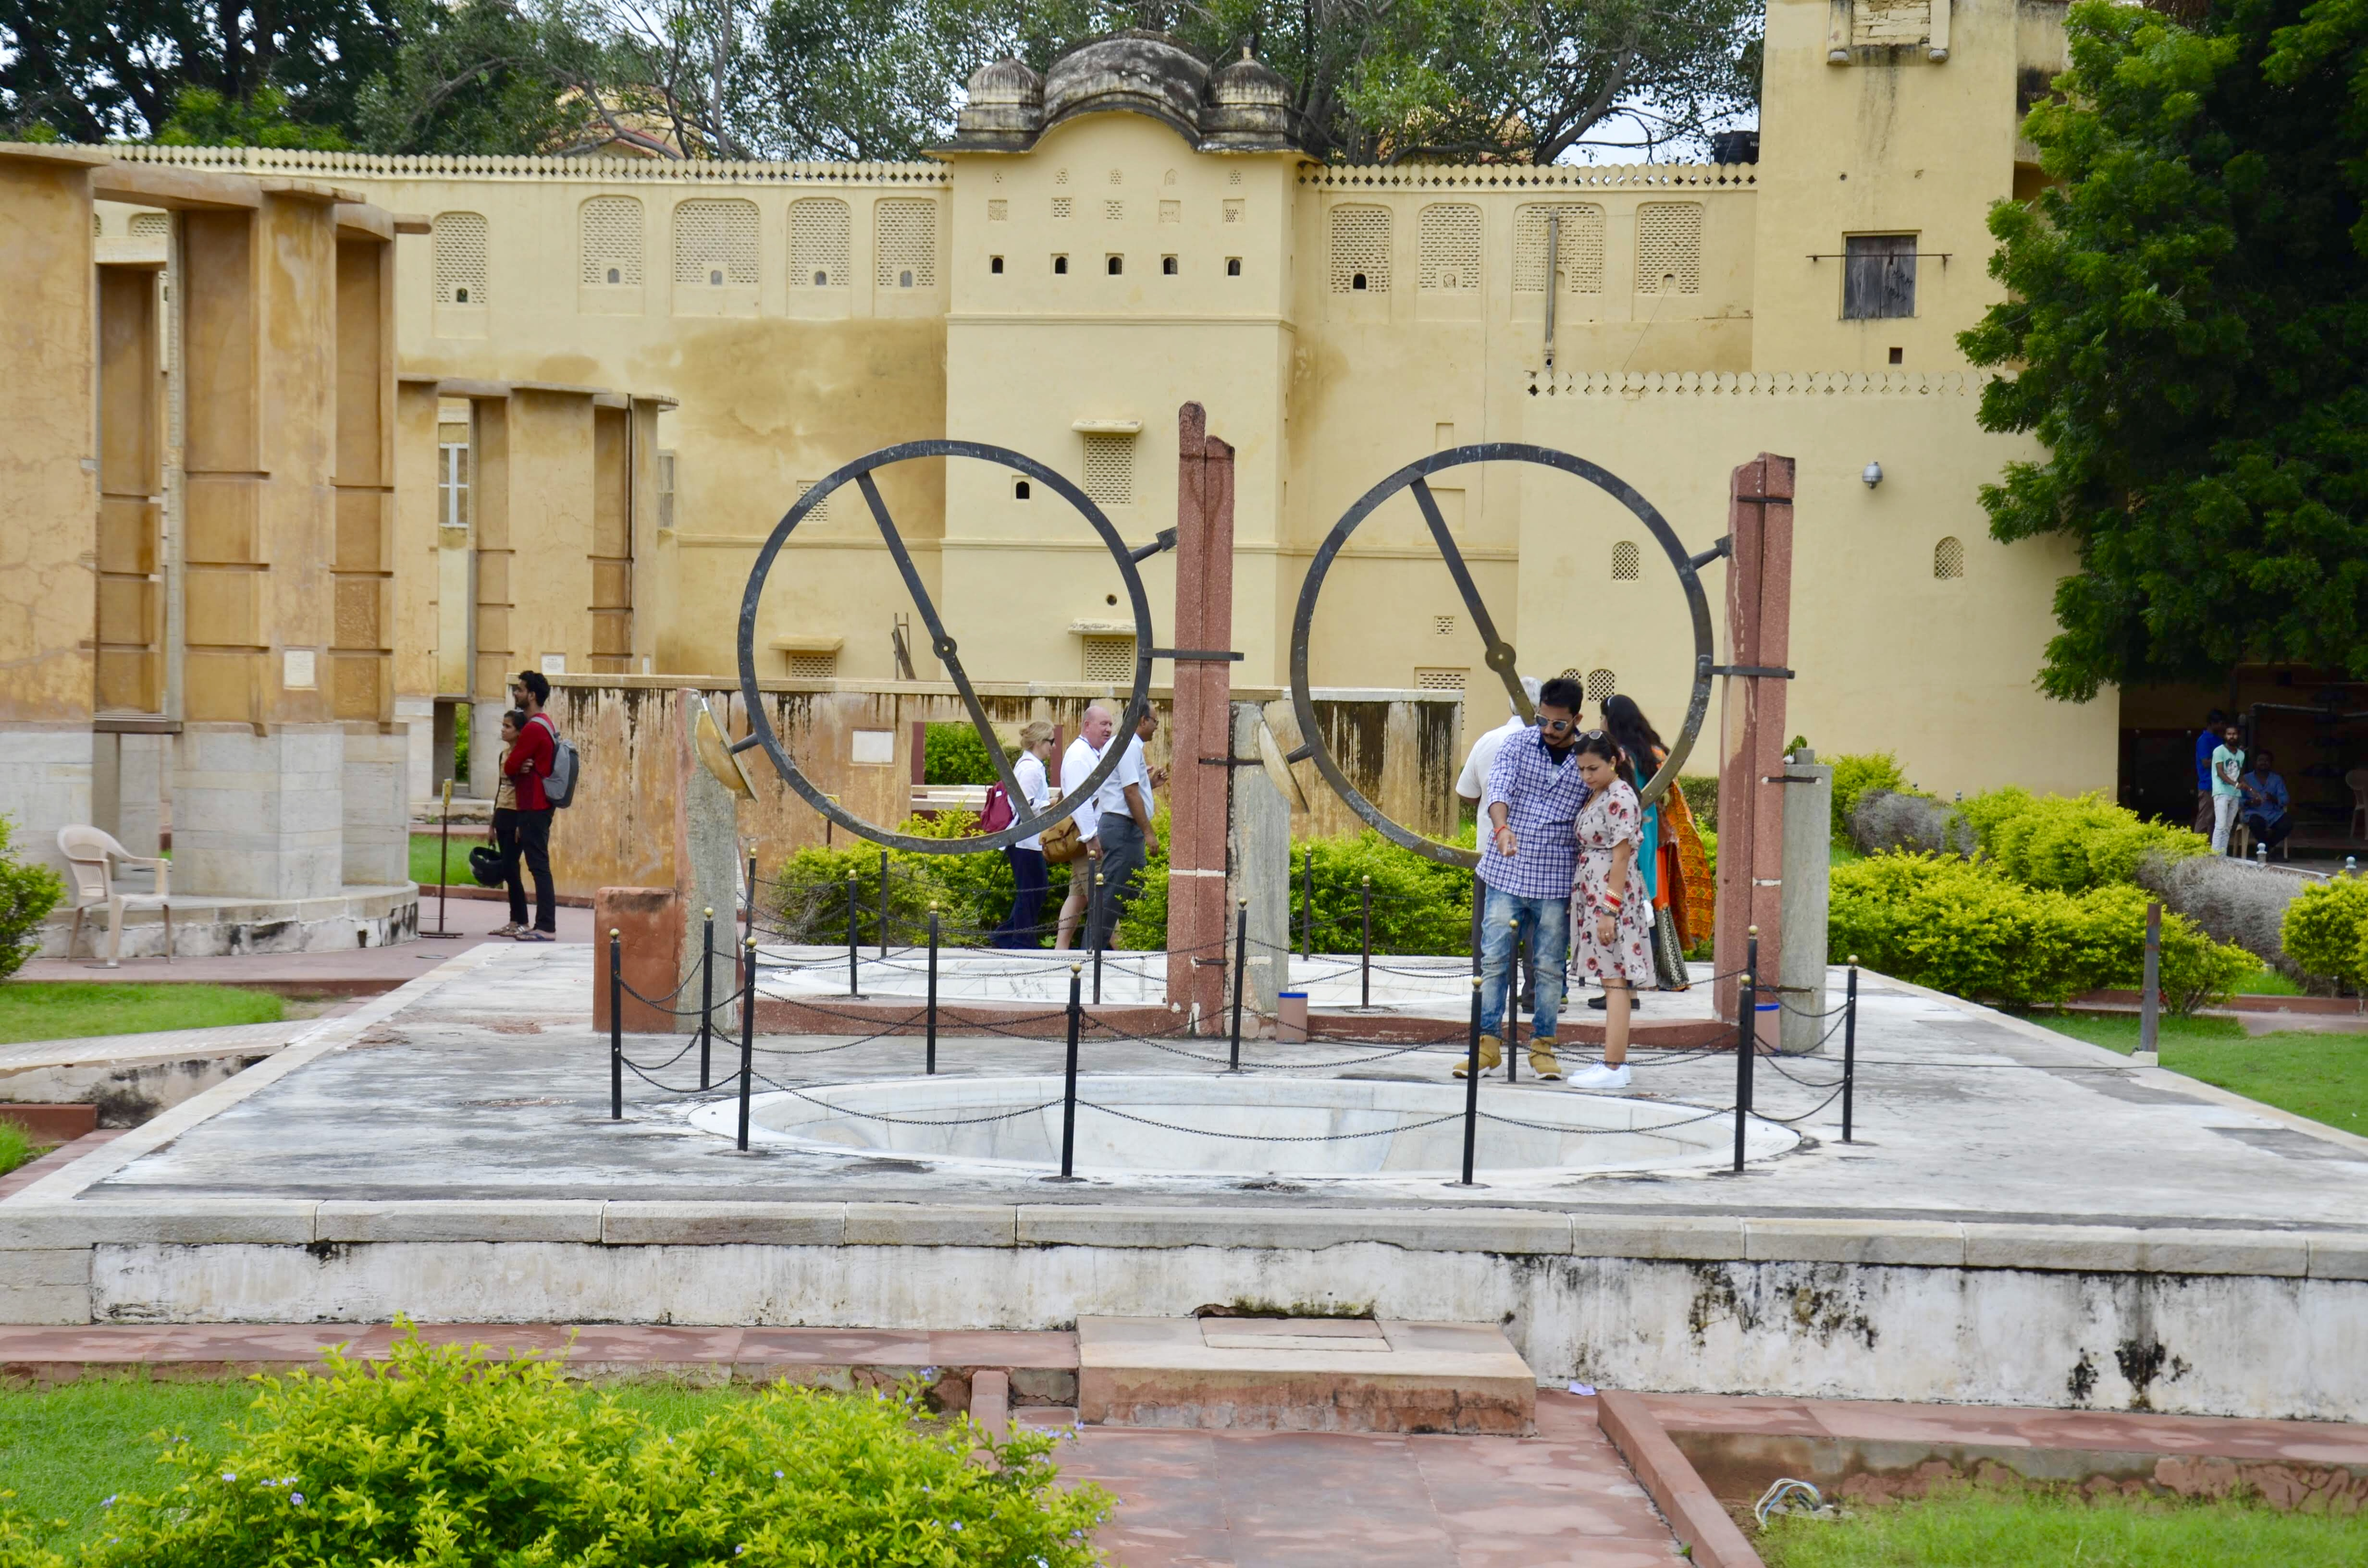 Observatório Astronômico Jantar Mantar em Jaipur